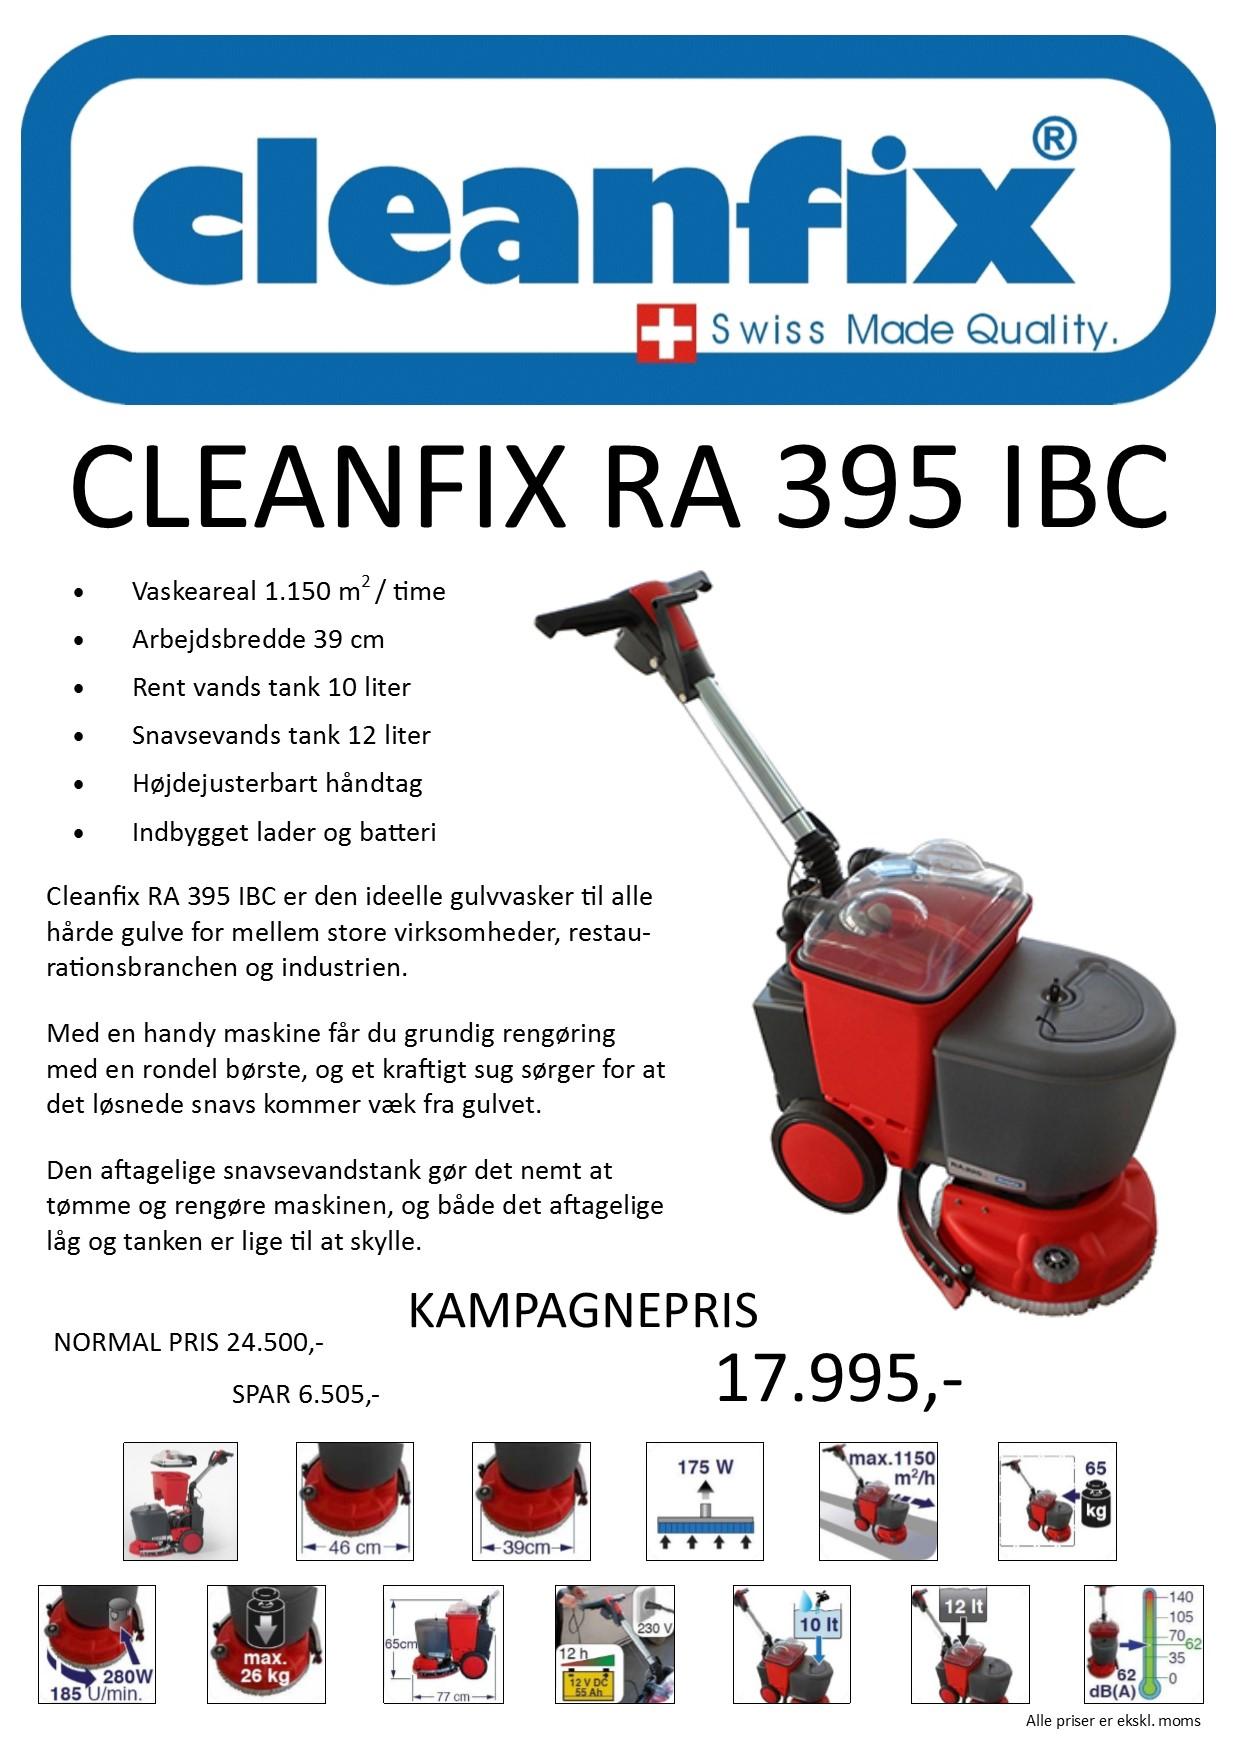 Cleanfix Kampagne Juni 2019